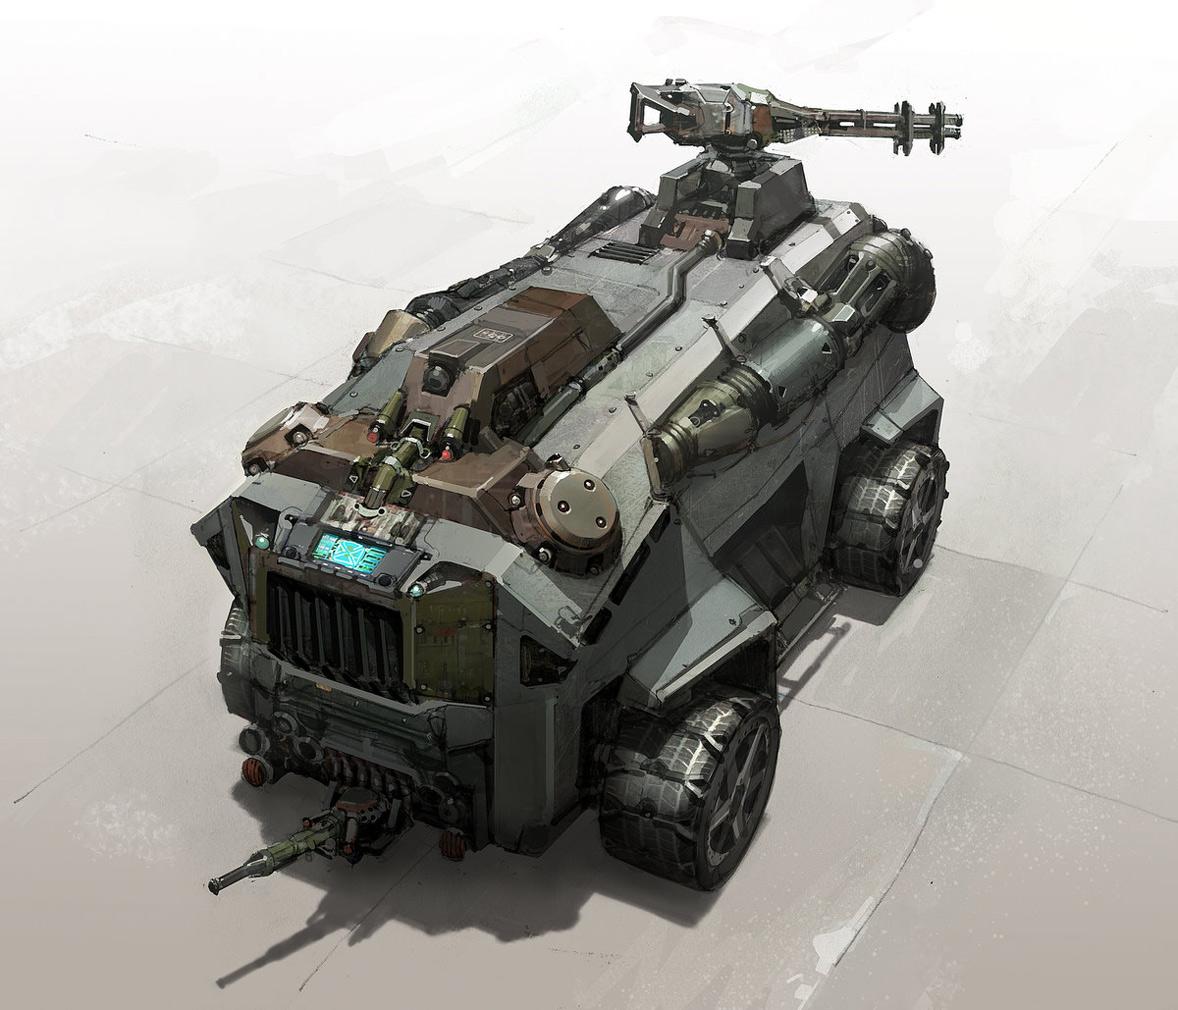 Xtreme Car Concept Vehicle Art By Khang Le